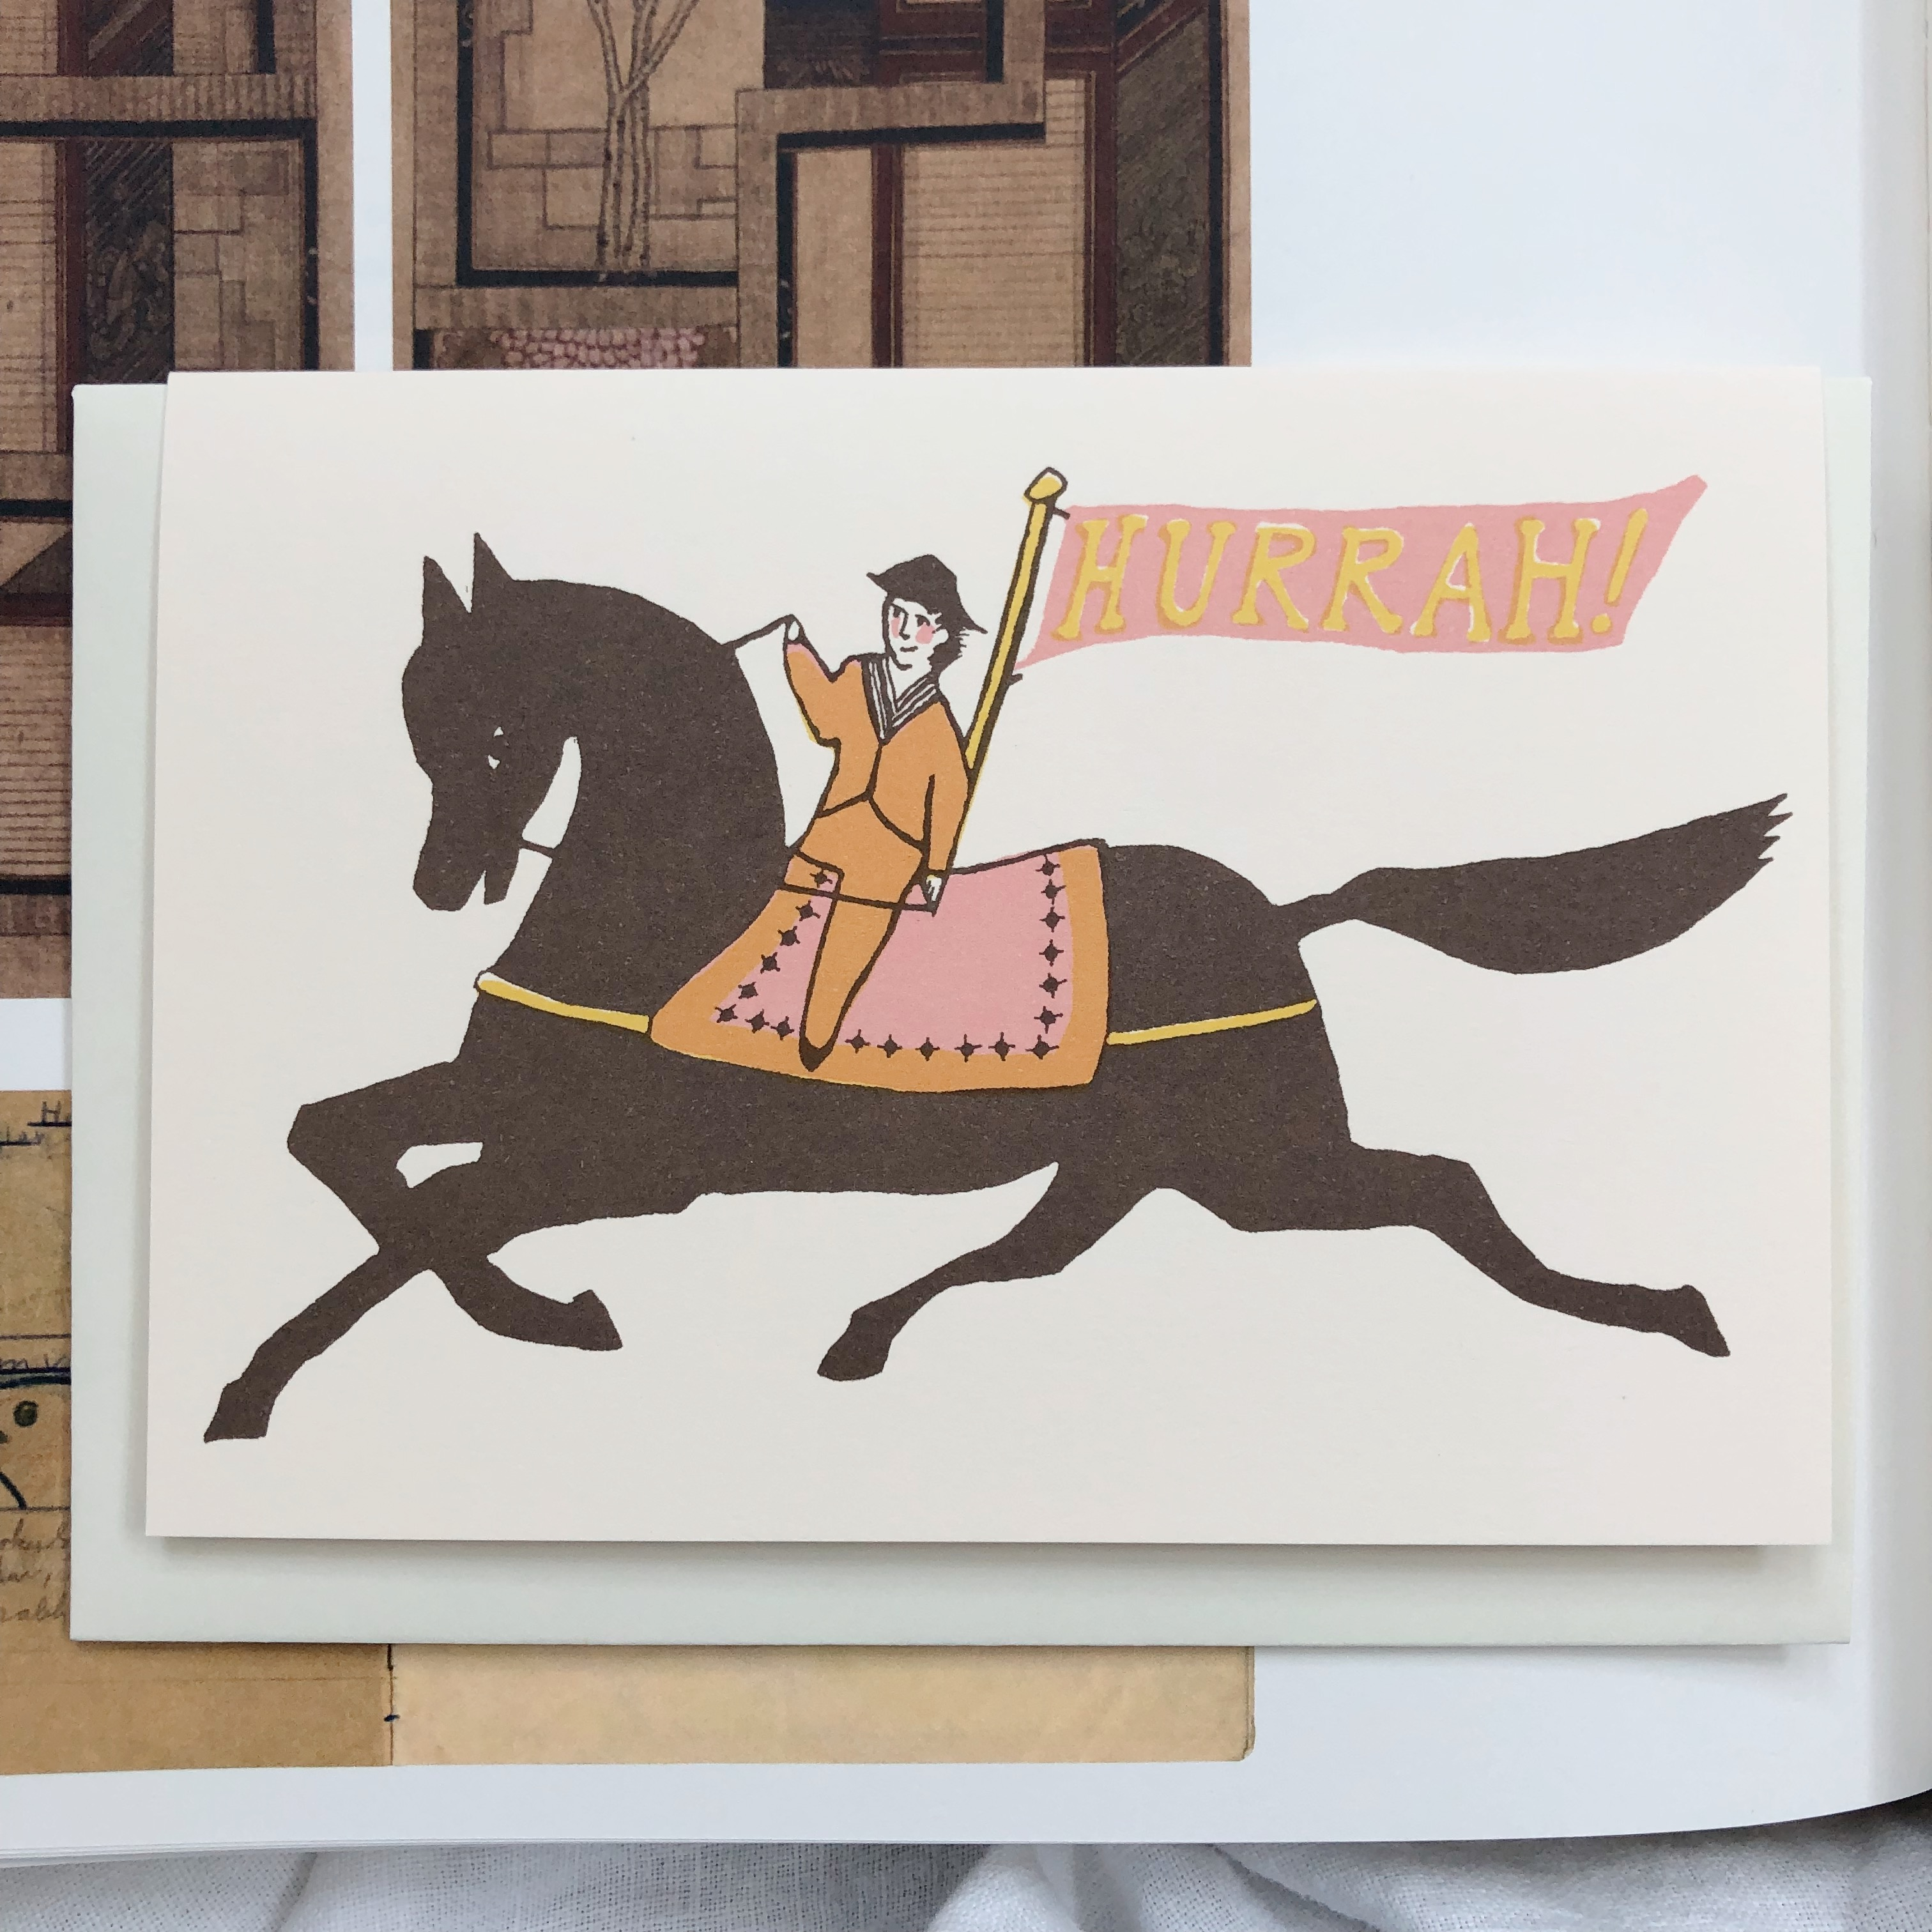 Dark Horse Hurrah